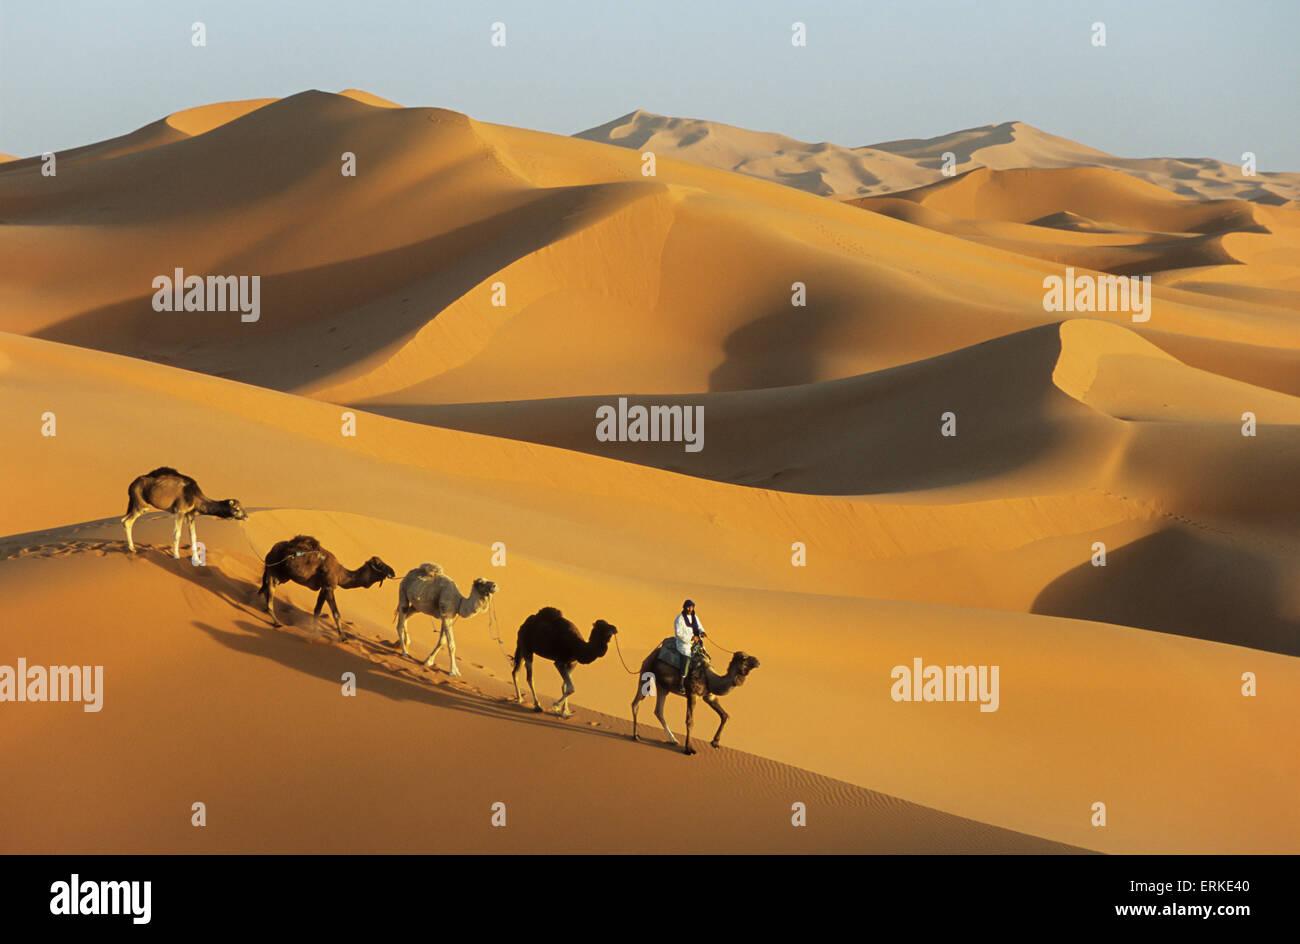 Berber with dromedaries, great sand dunes of Erg Chebbi, Sahara desert, near Merzouga, Morocco - Stock Image